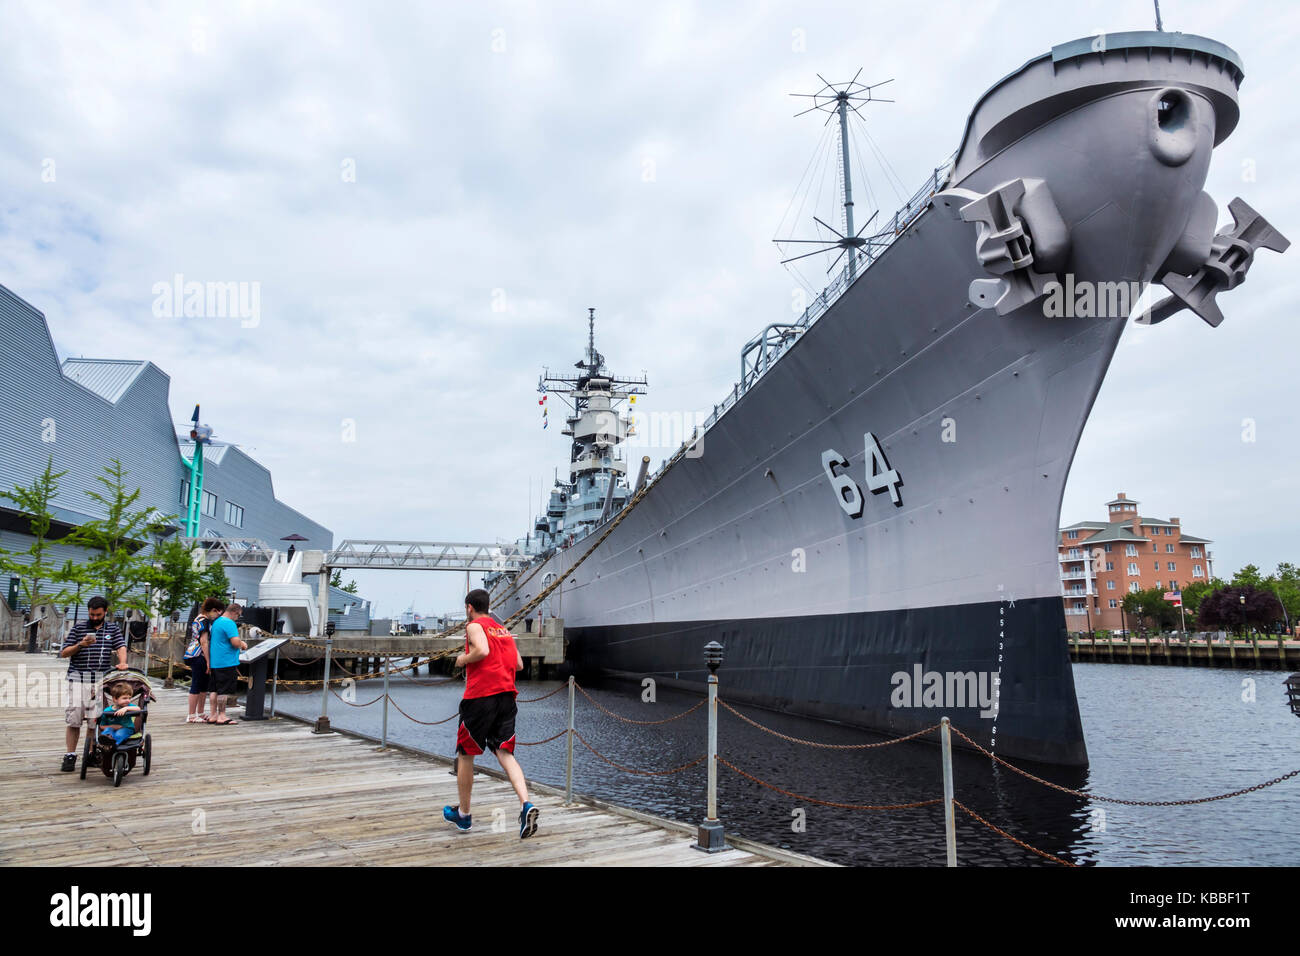 Norfolk Virginia Elizabeth River Downtown waterfront Naticus maritime museum historic battleship USS Wisconsin BB - Stock Image